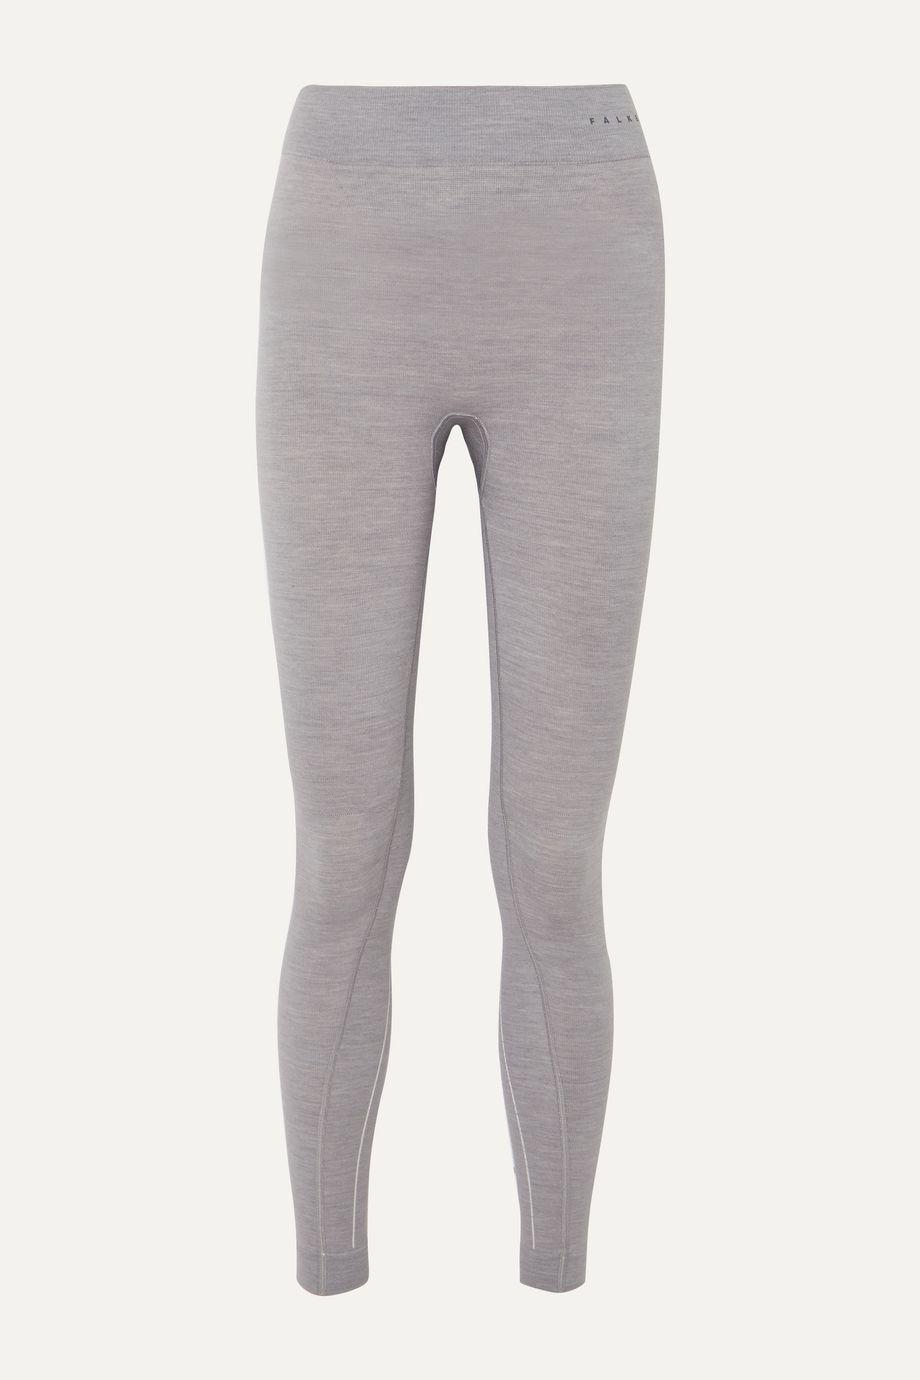 FALKE Ergonomic Sport System Mélange wool-blend leggings